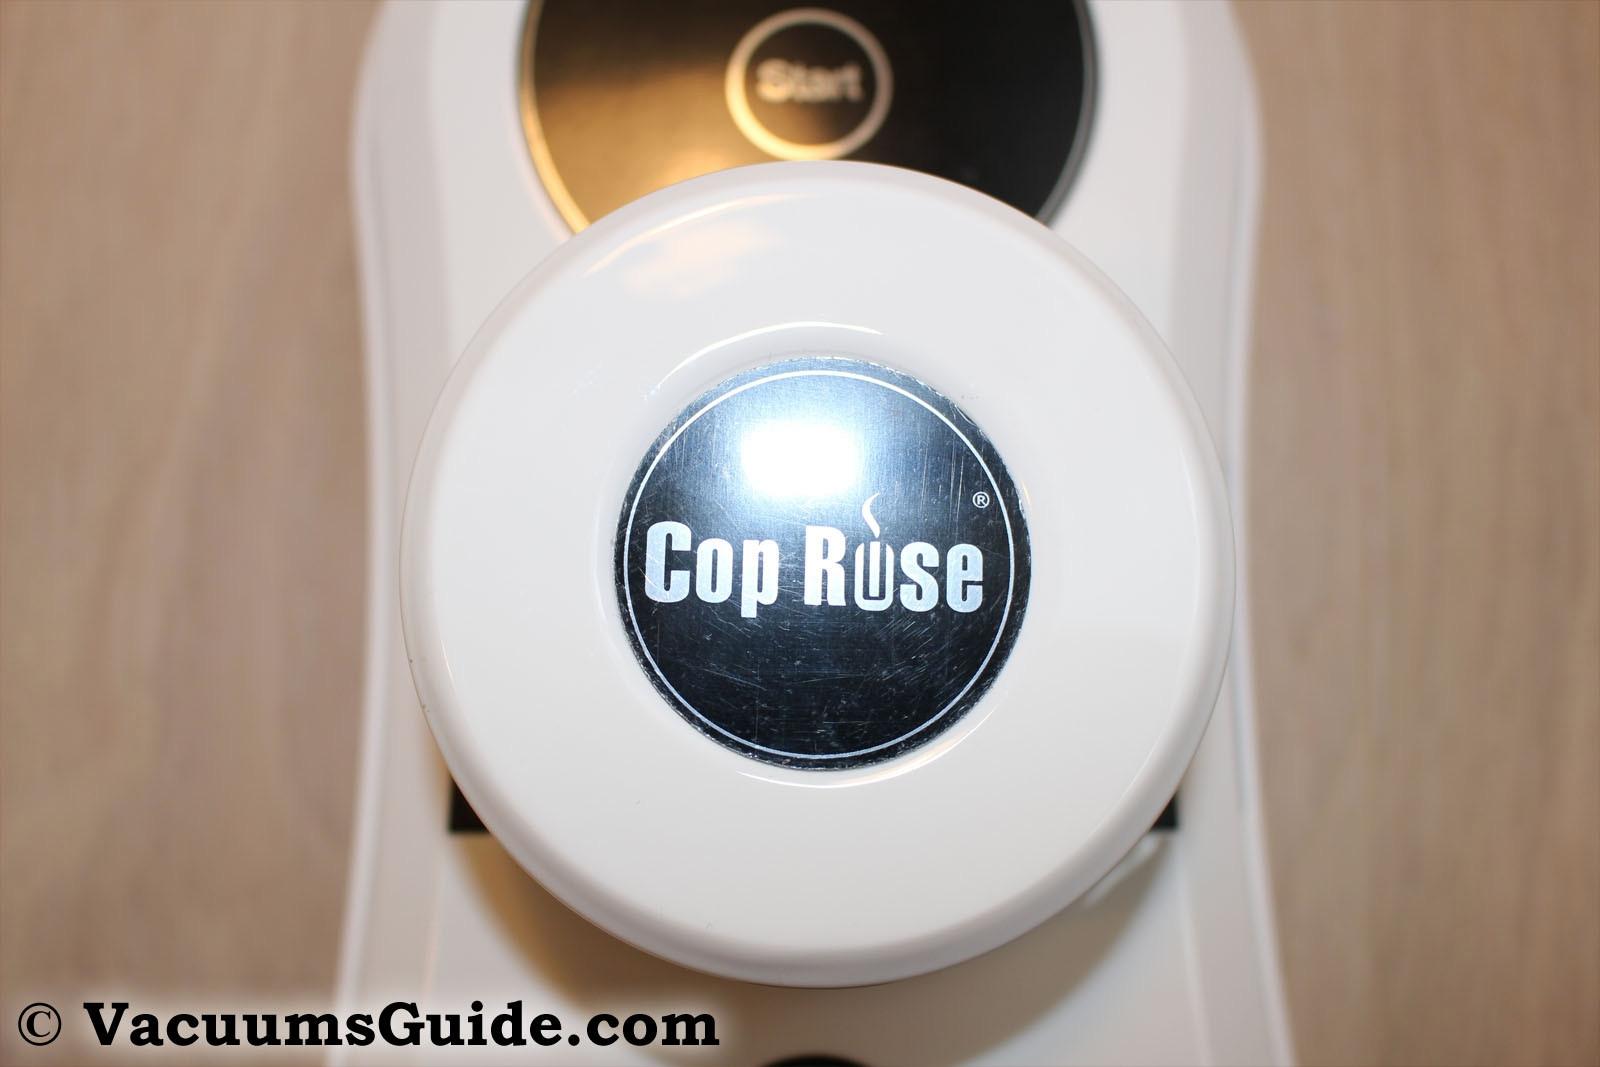 Cop Rose top view